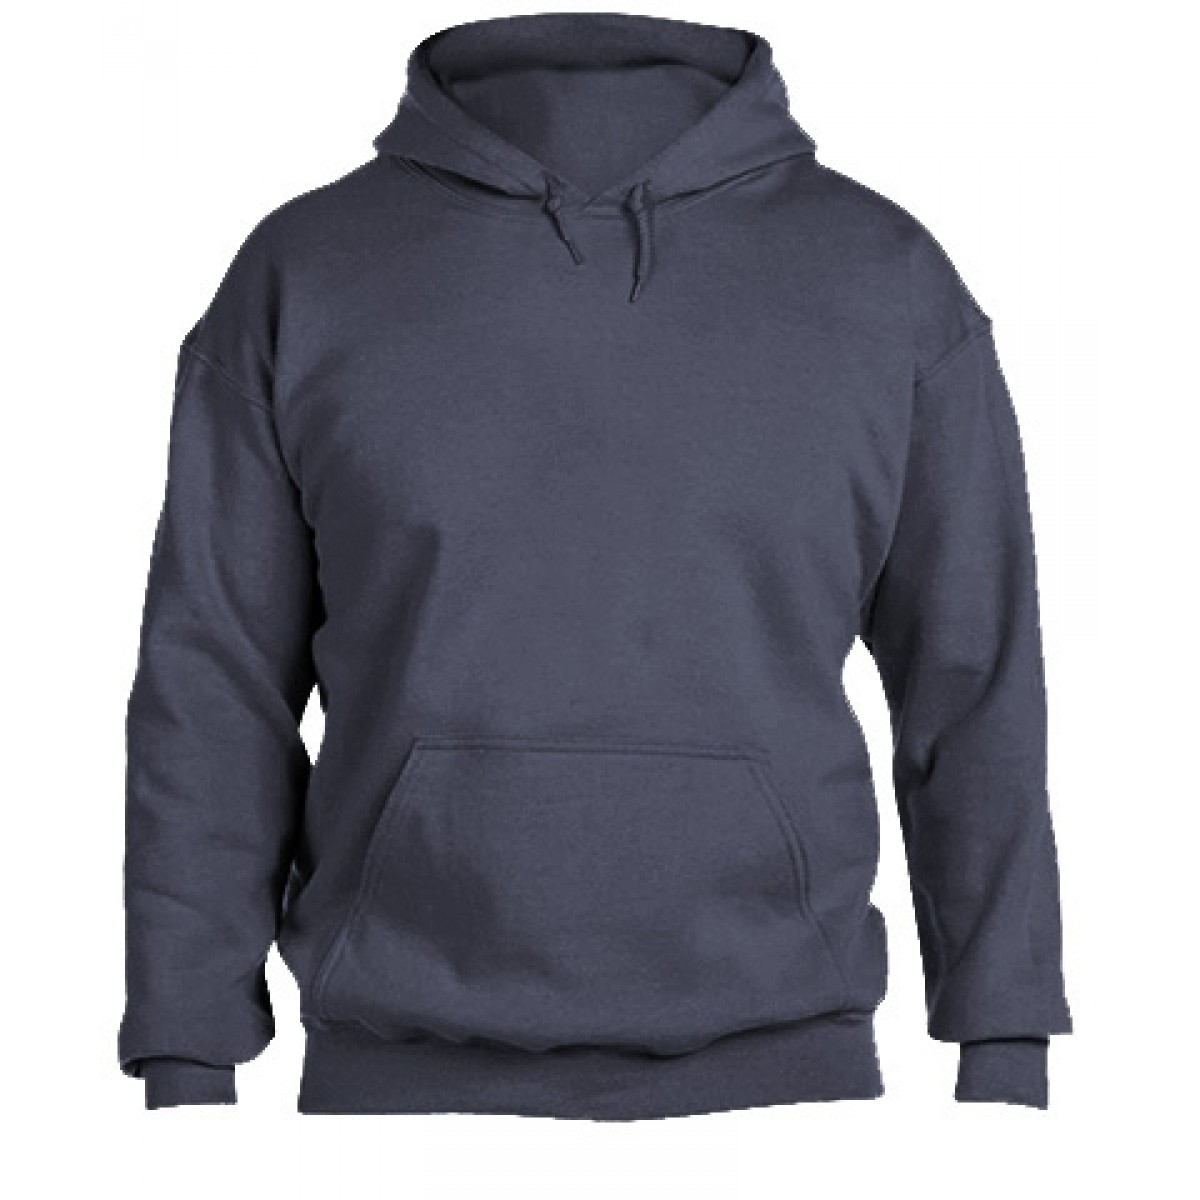 Solid Hooded Sweatshirt  50/50 Heavy Blend-Heather Navy-XL